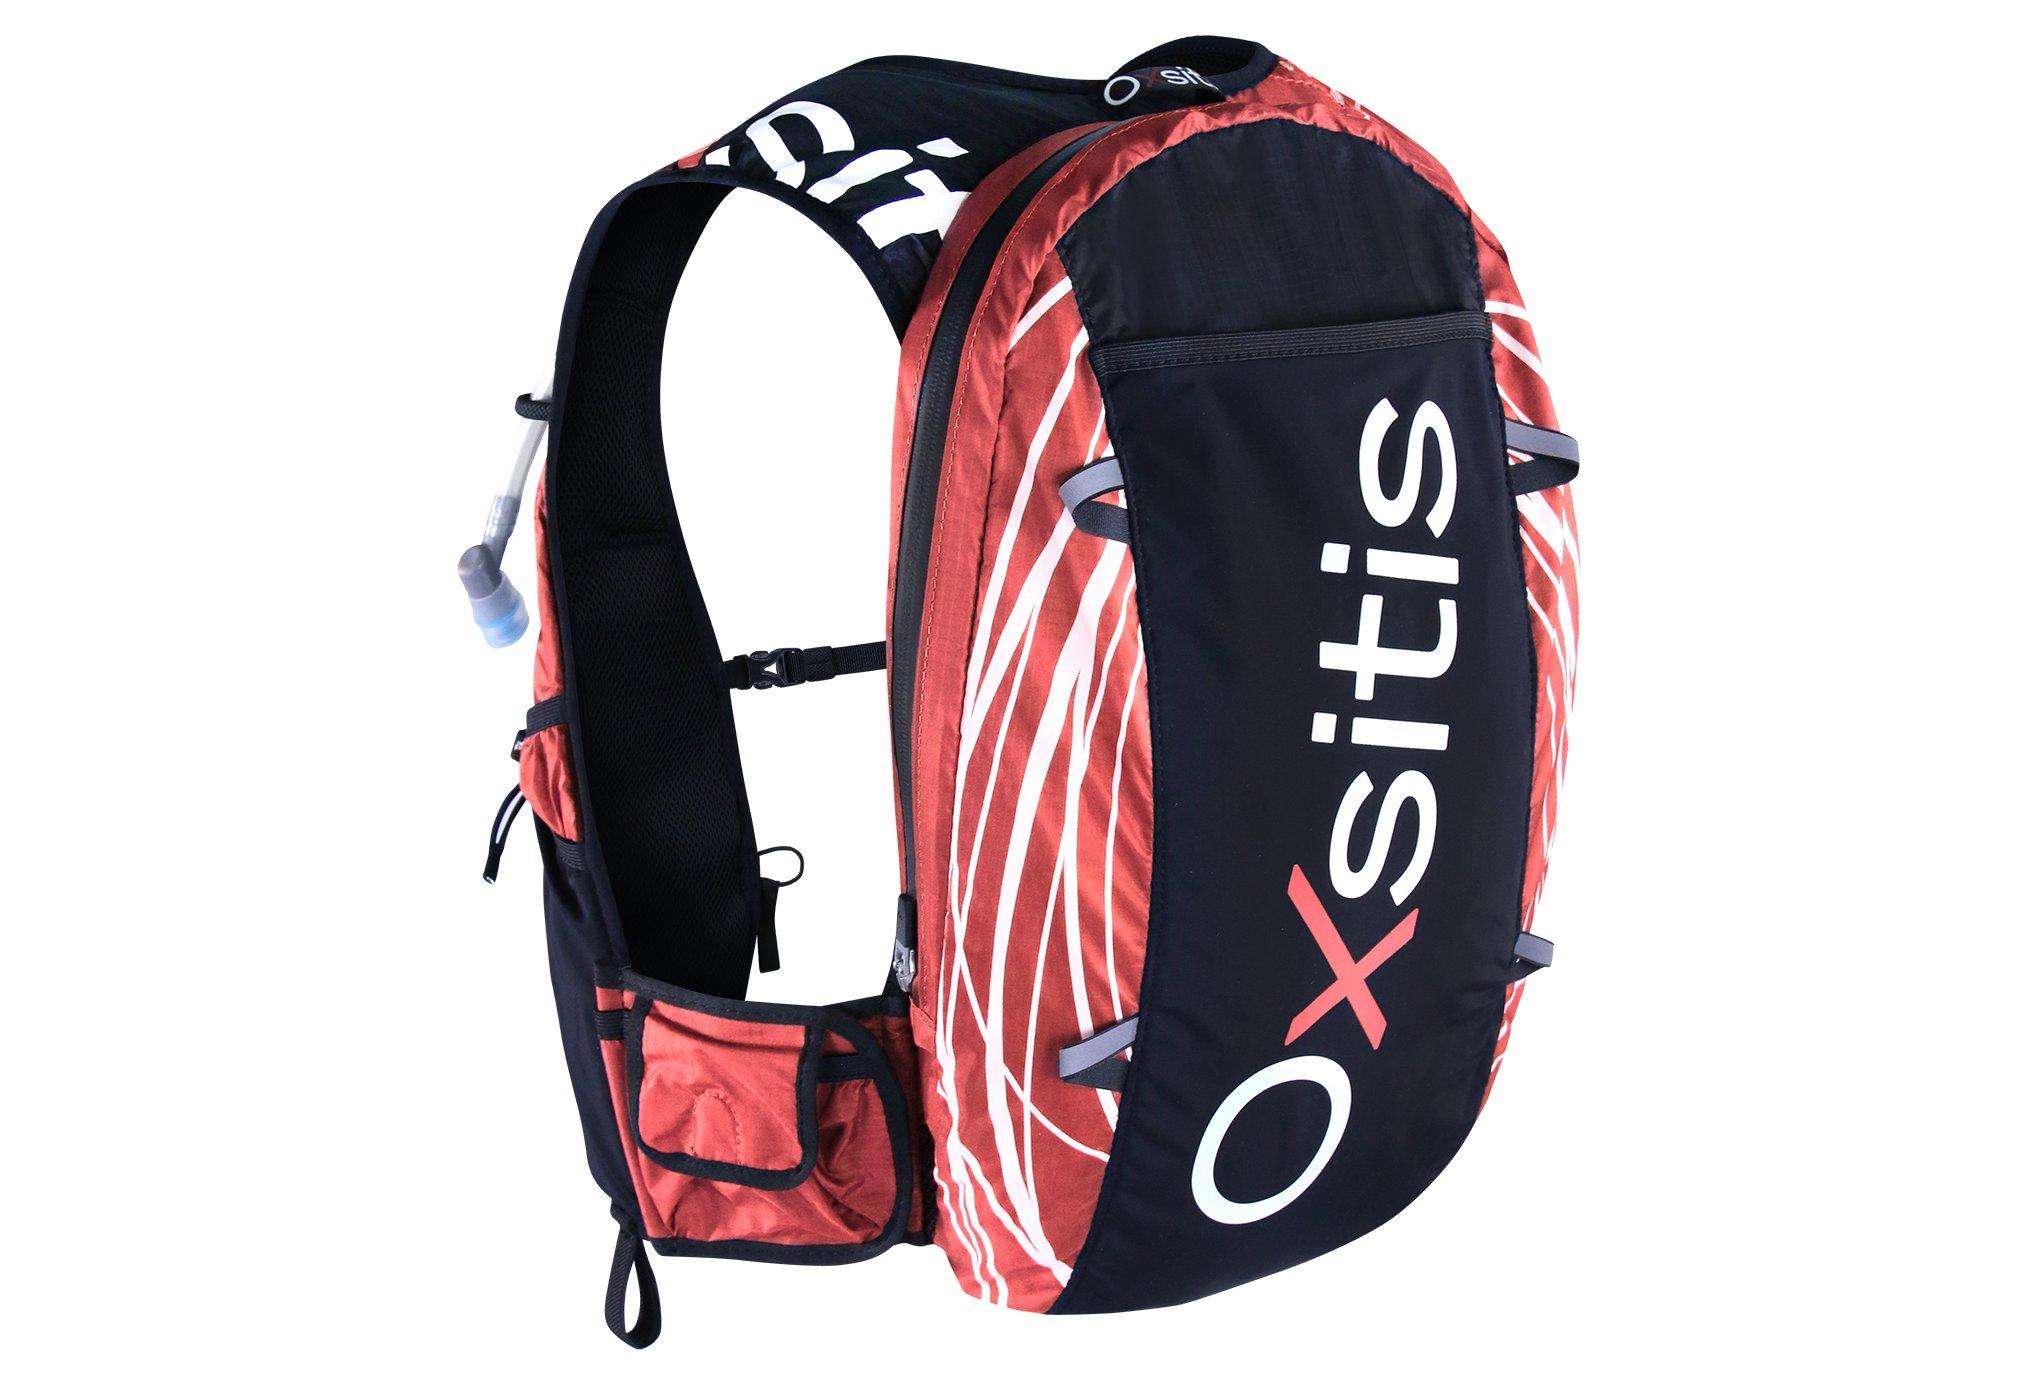 Oxsitis Ace 16 W Sac hydratation / Gourde